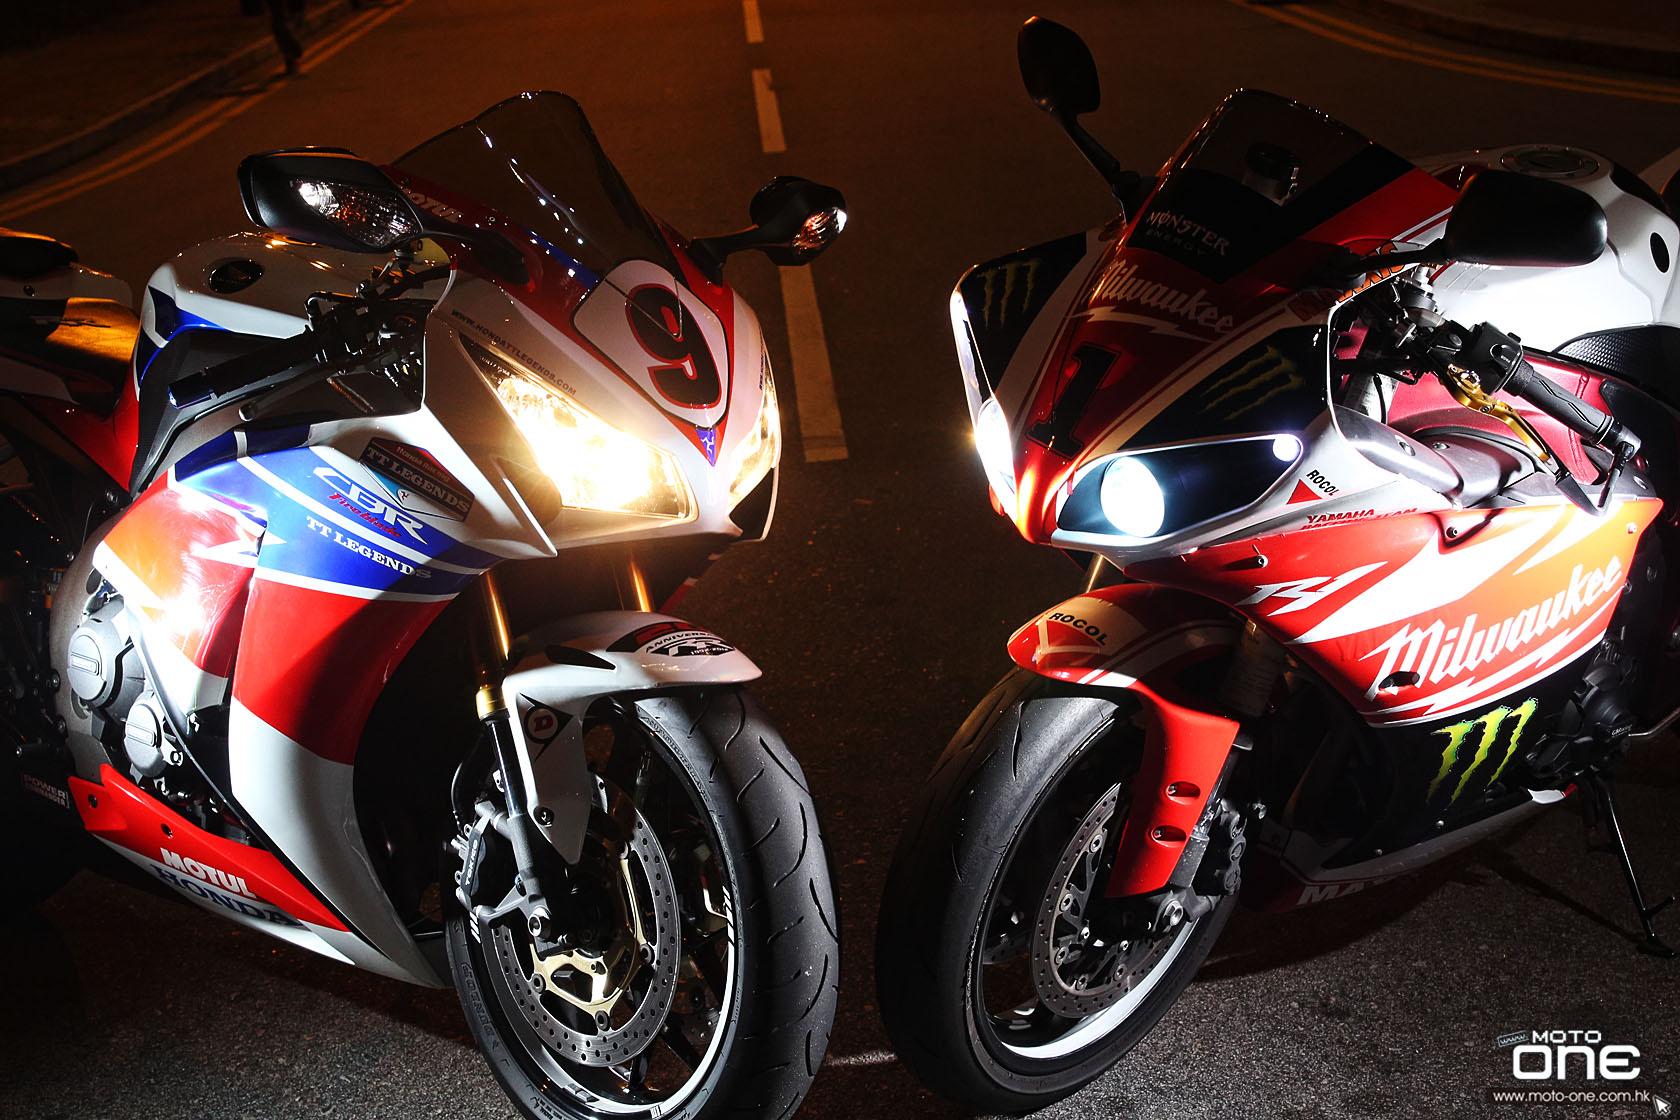 Yamaha YZF R1 & HONDA CBR1000RR-澳門格電拉花現香港